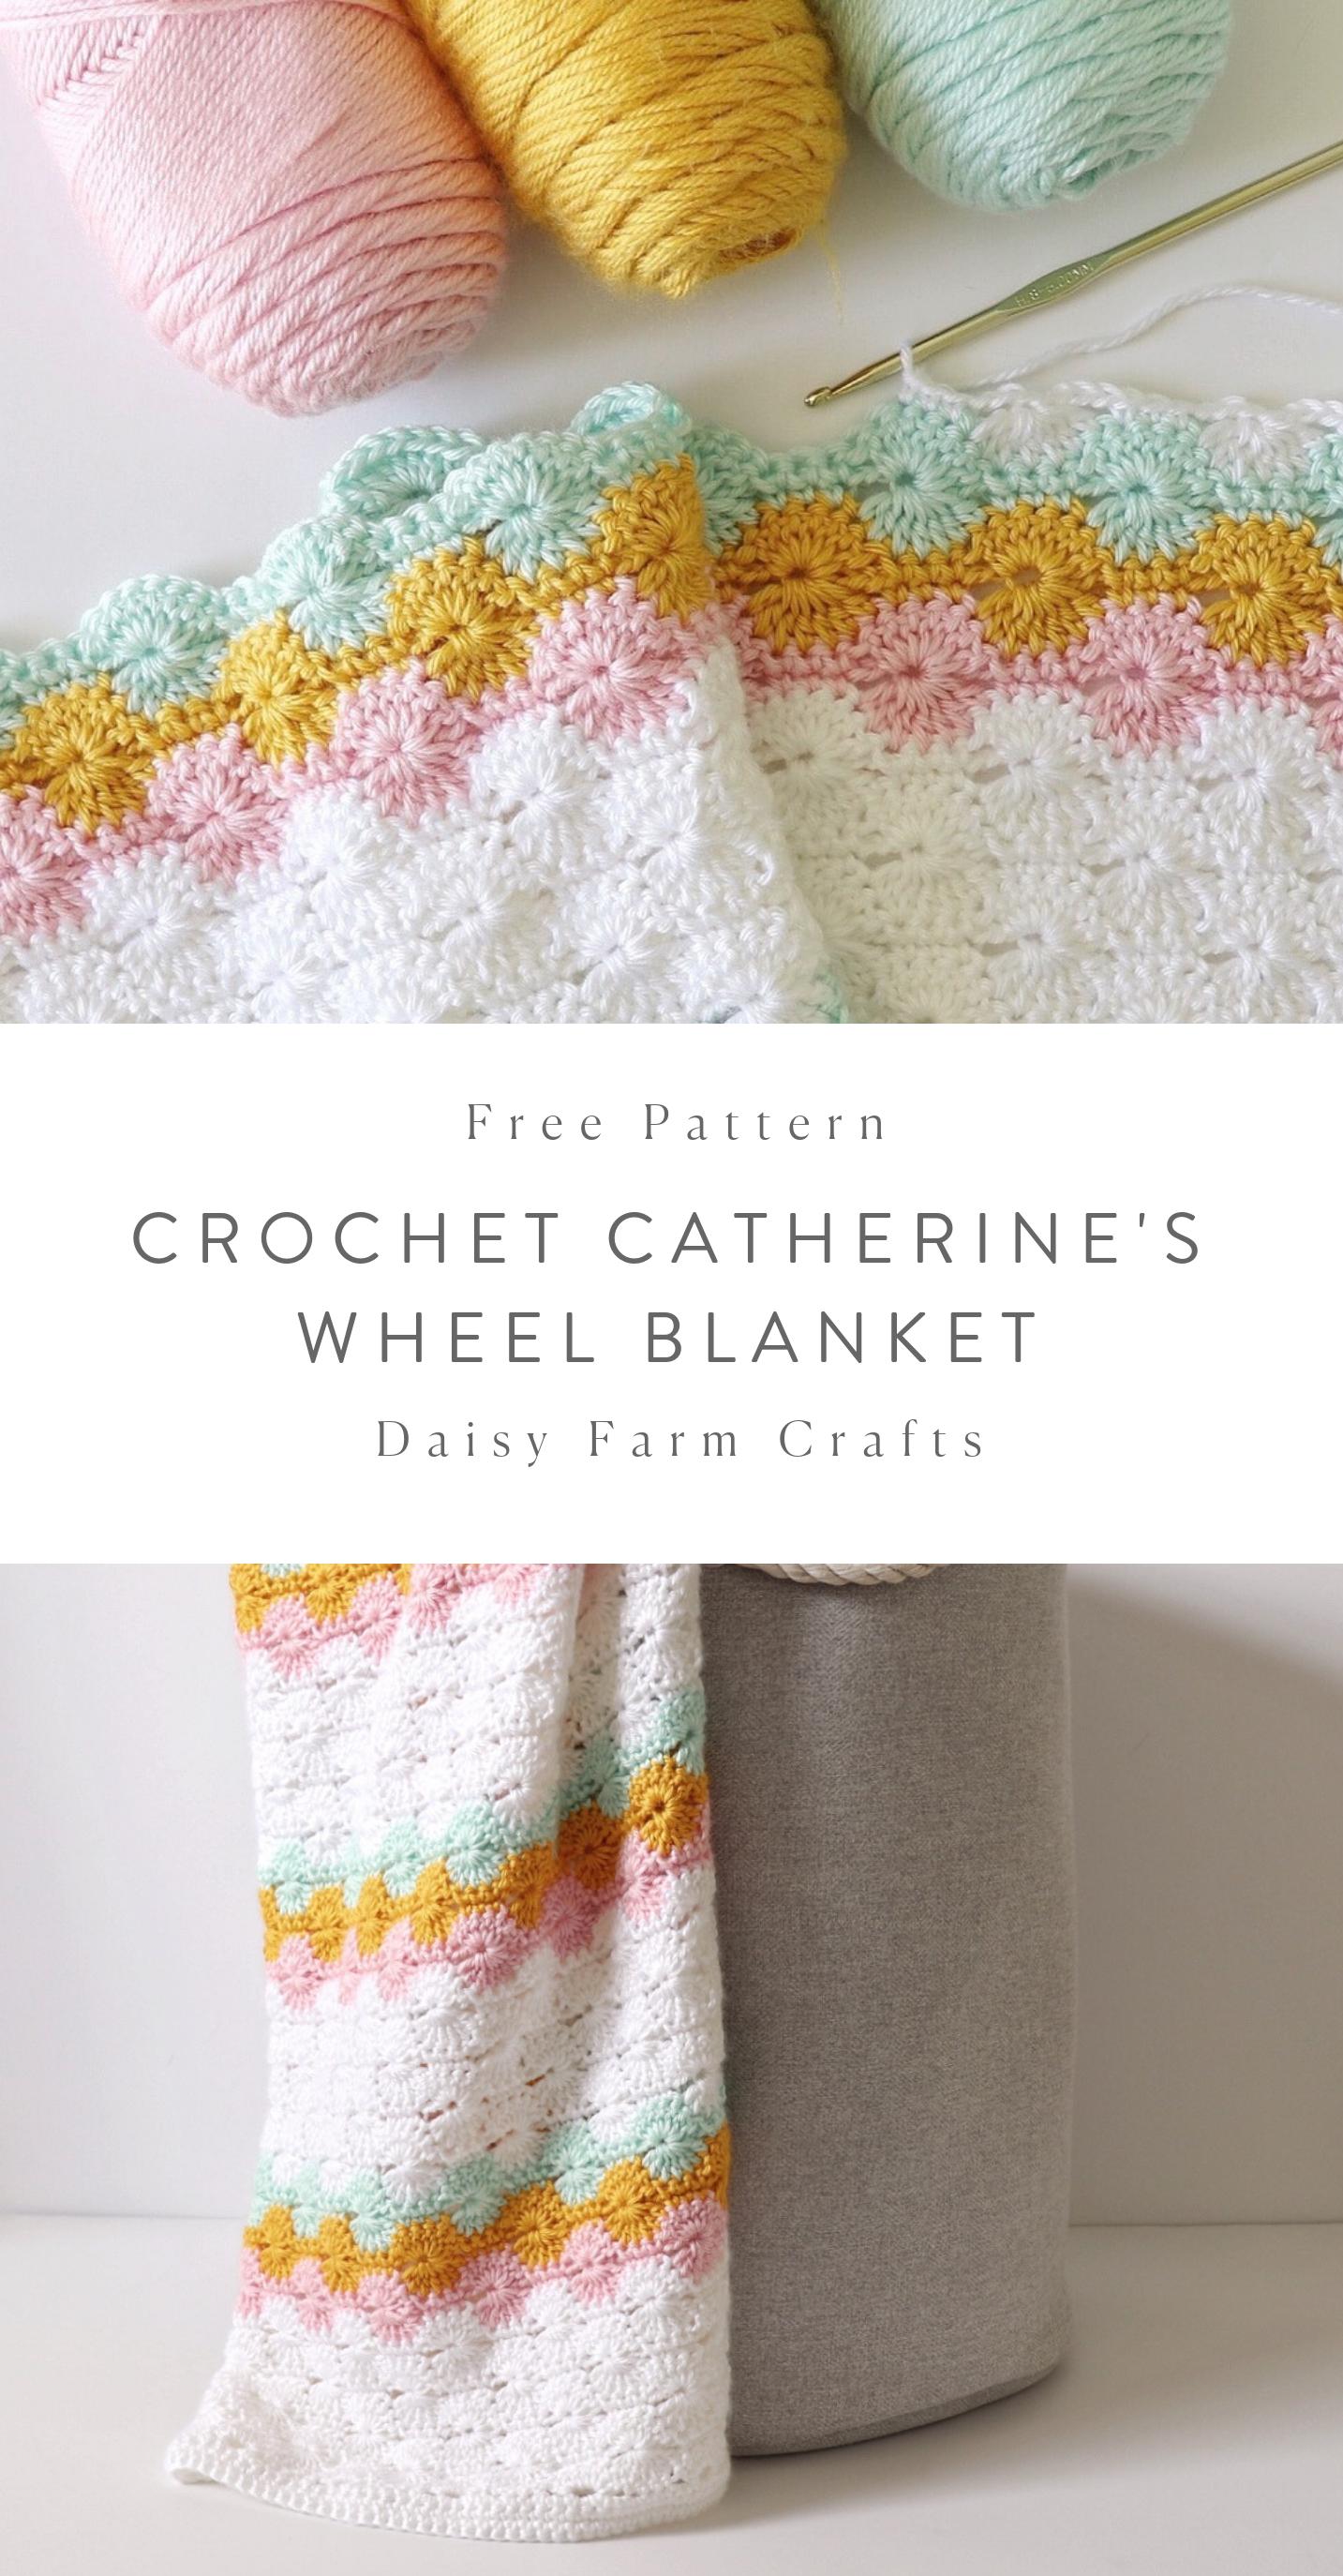 Free Pattern - Classic Crochet Catherine's Wheel Blanket